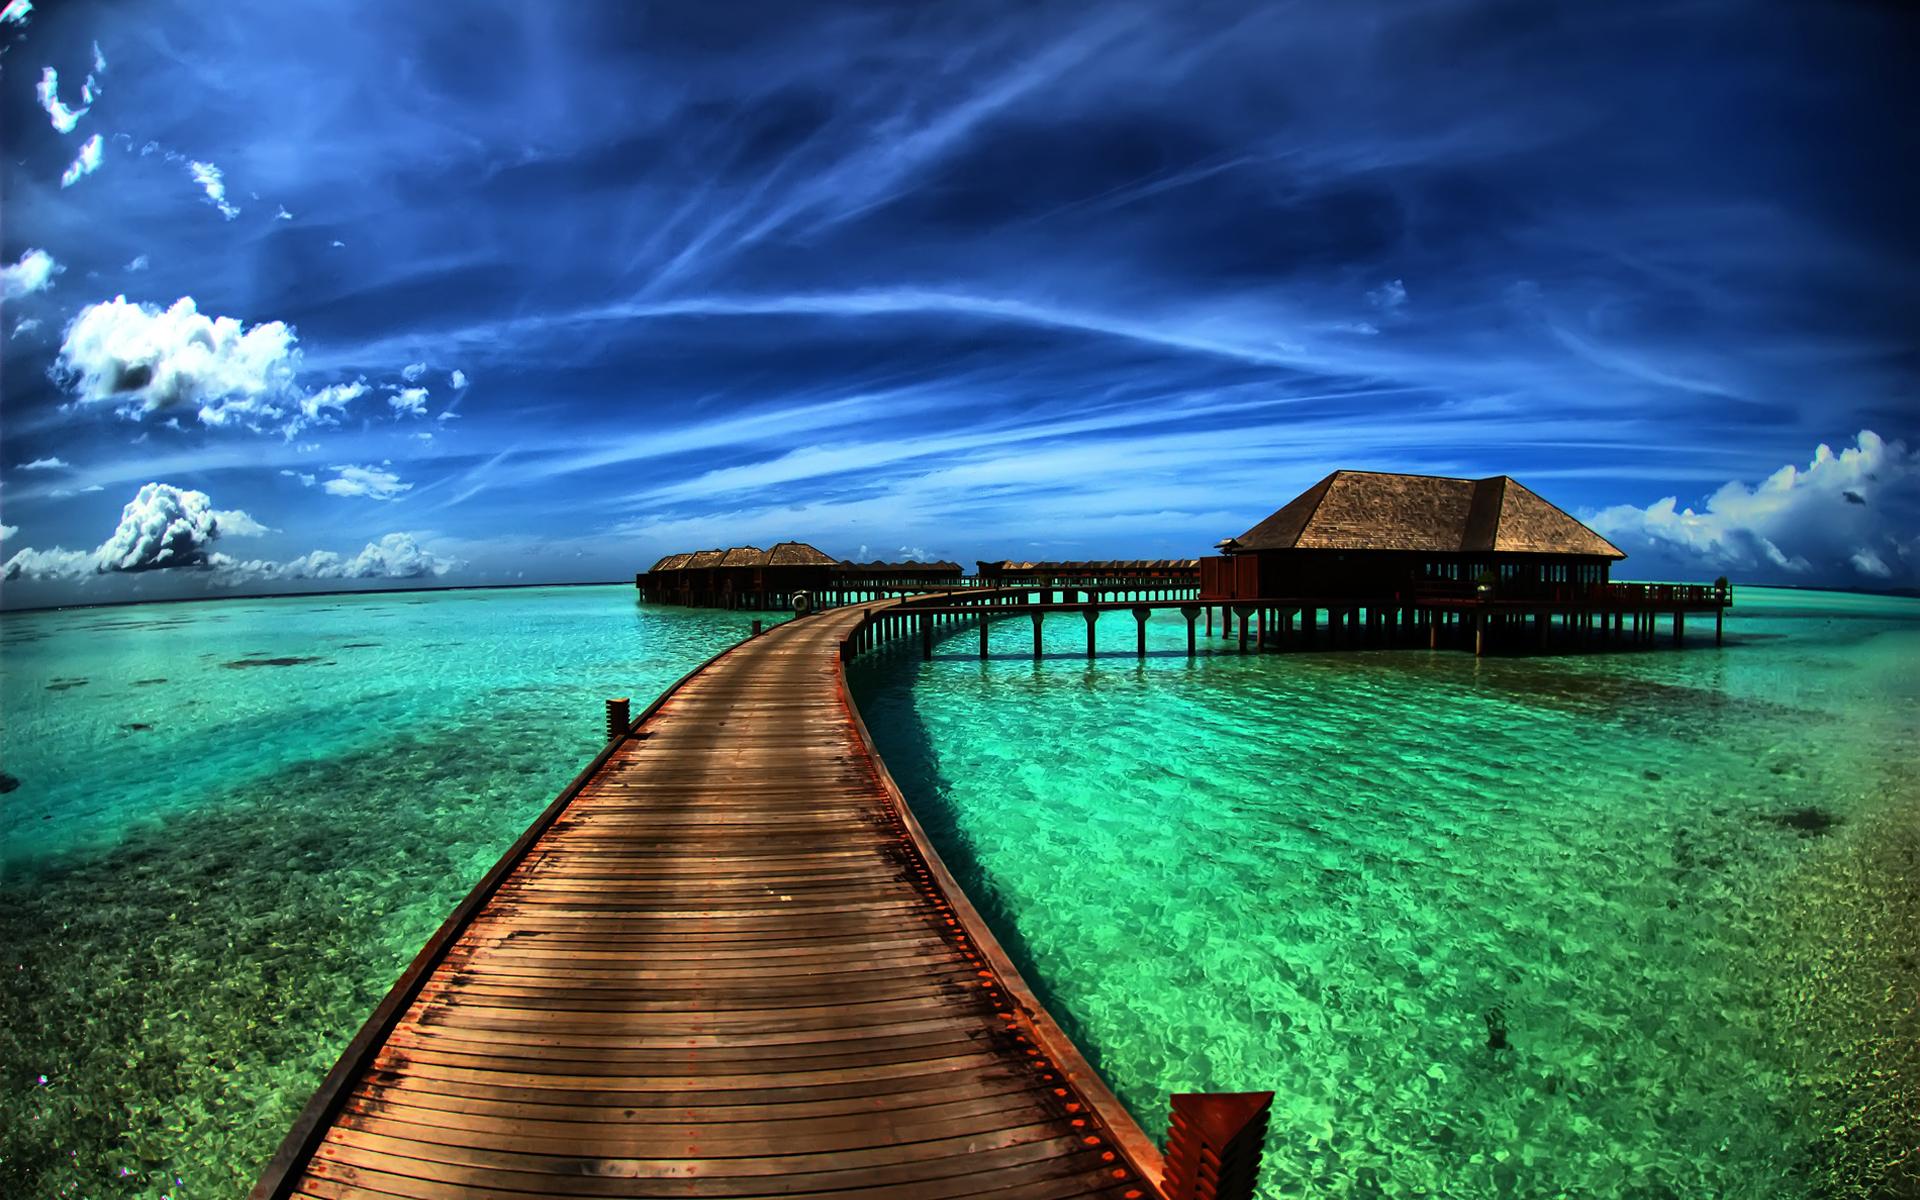 tropical-beach-background